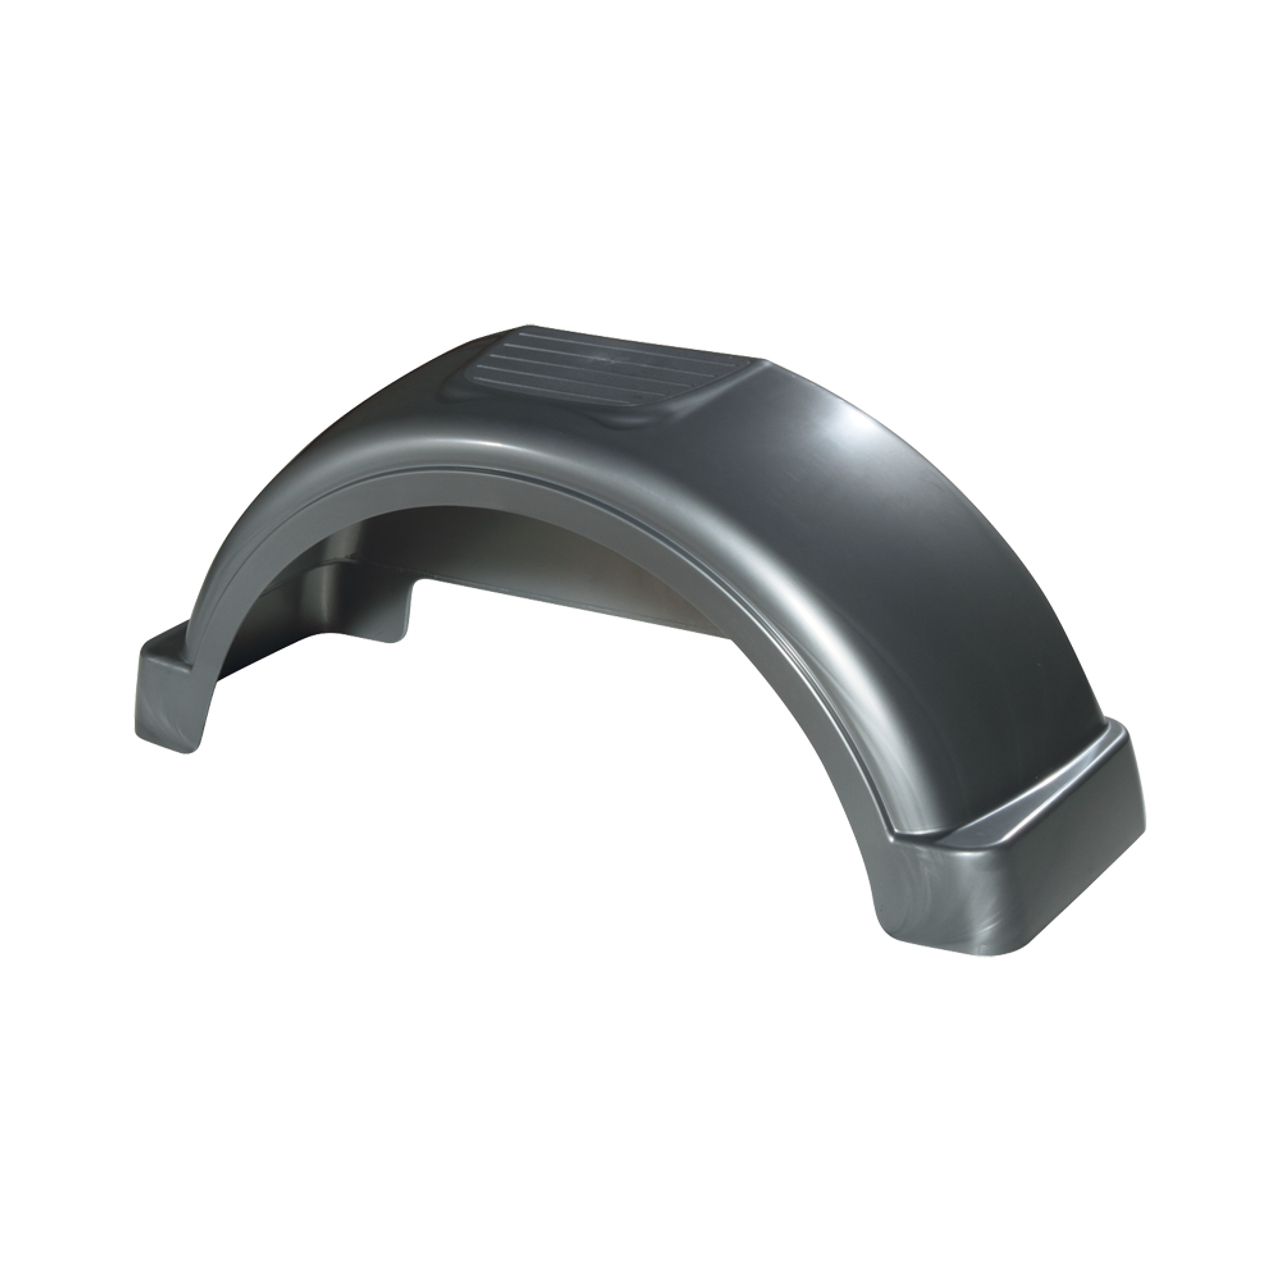 "Silver Plastic Trailer Fender - 13"" Tire Size - One Fender - 008563"